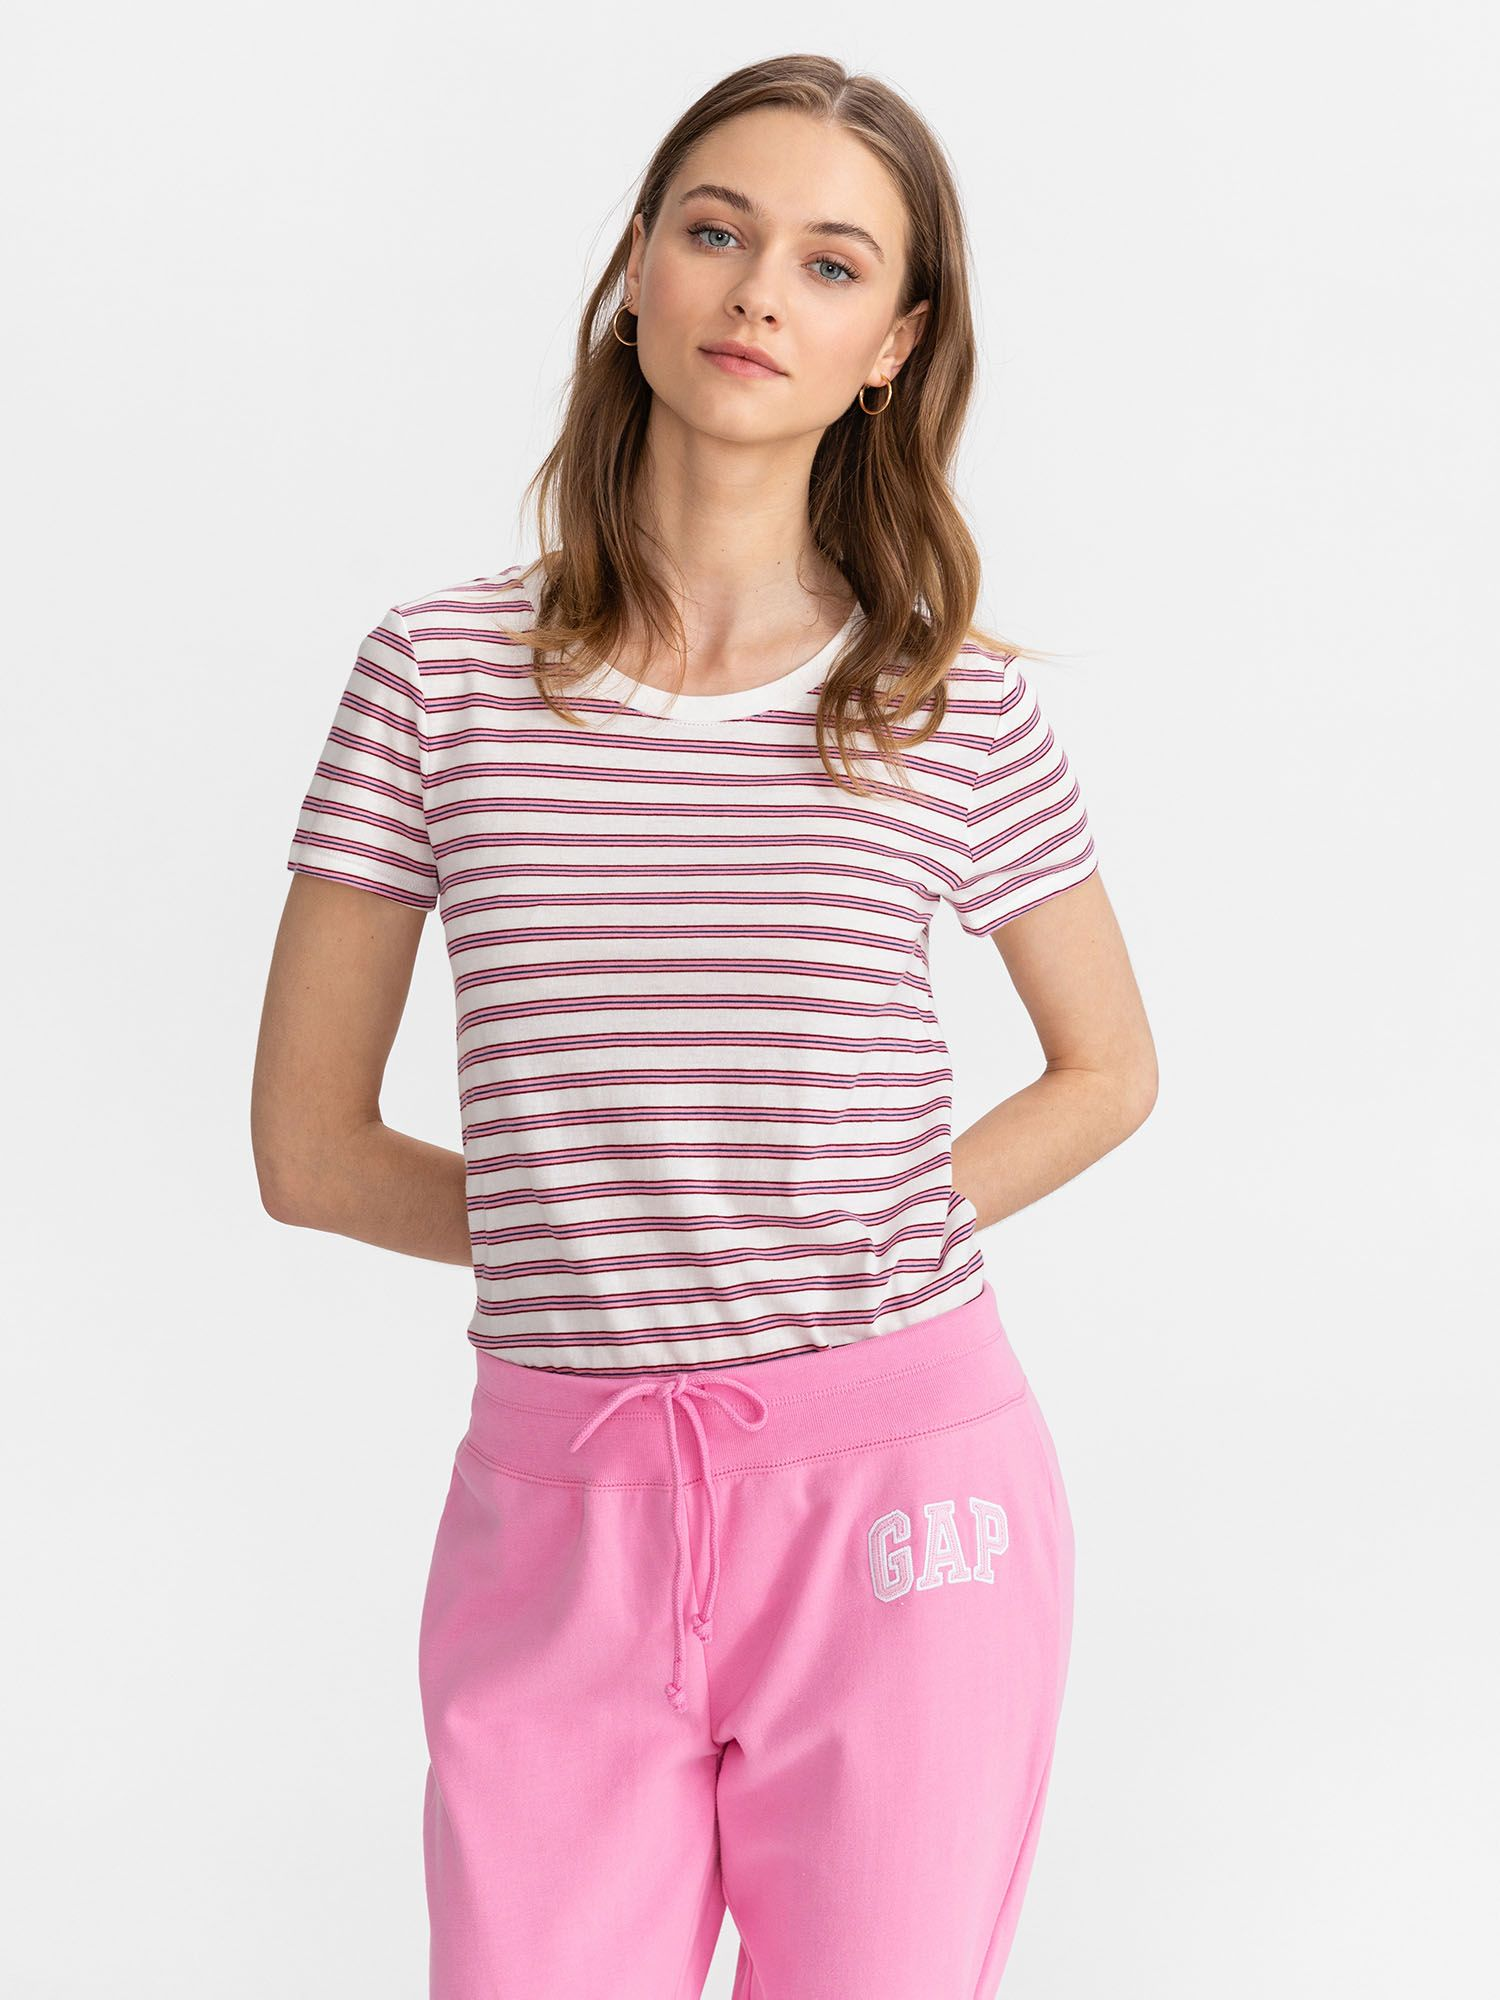 GAP pink striped T-shirt